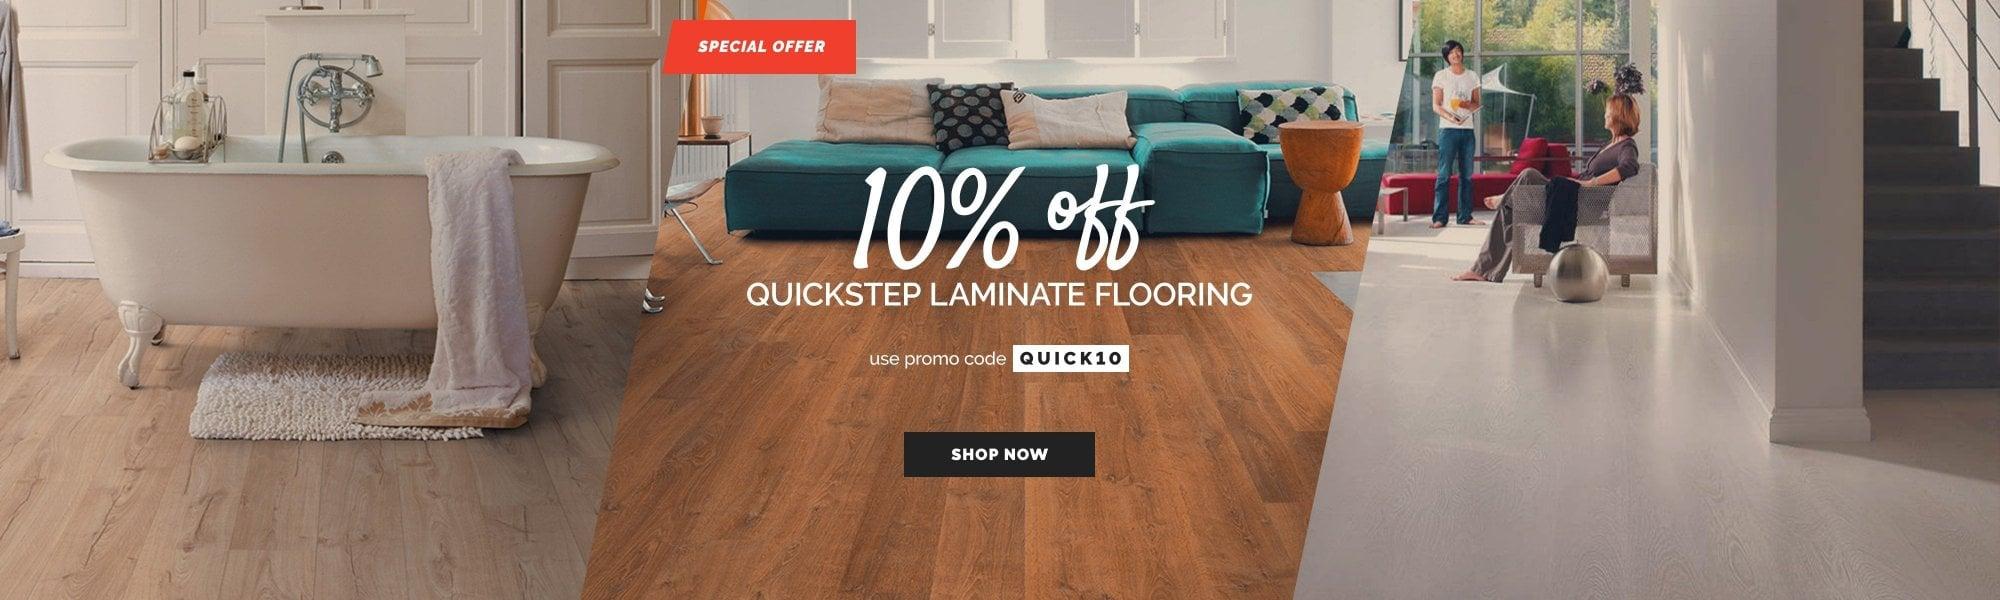 10% off Quickstep